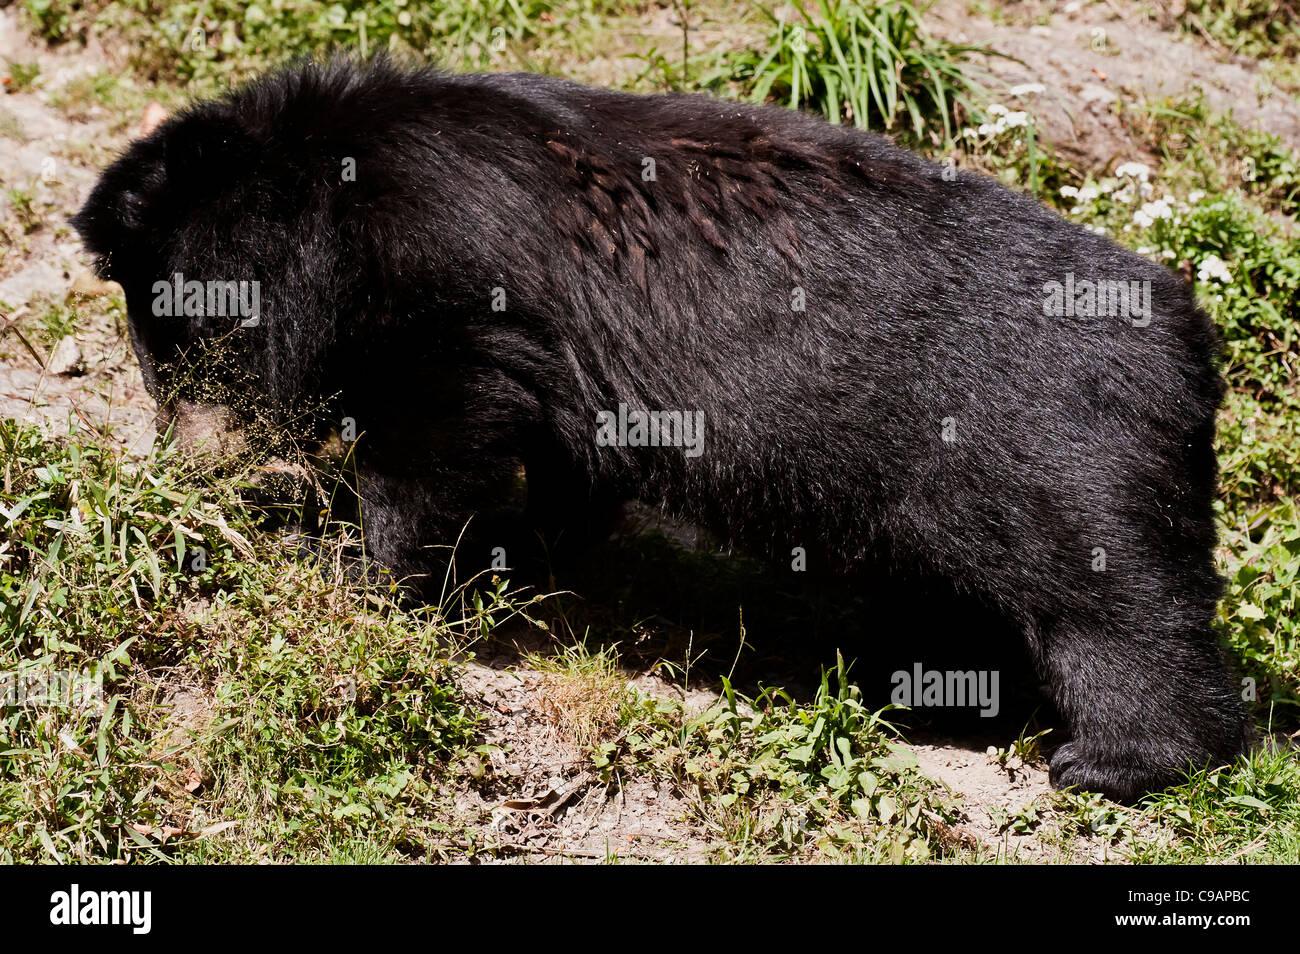 Himalayan Black Bear walking through grass in the zoo . - Stock Image